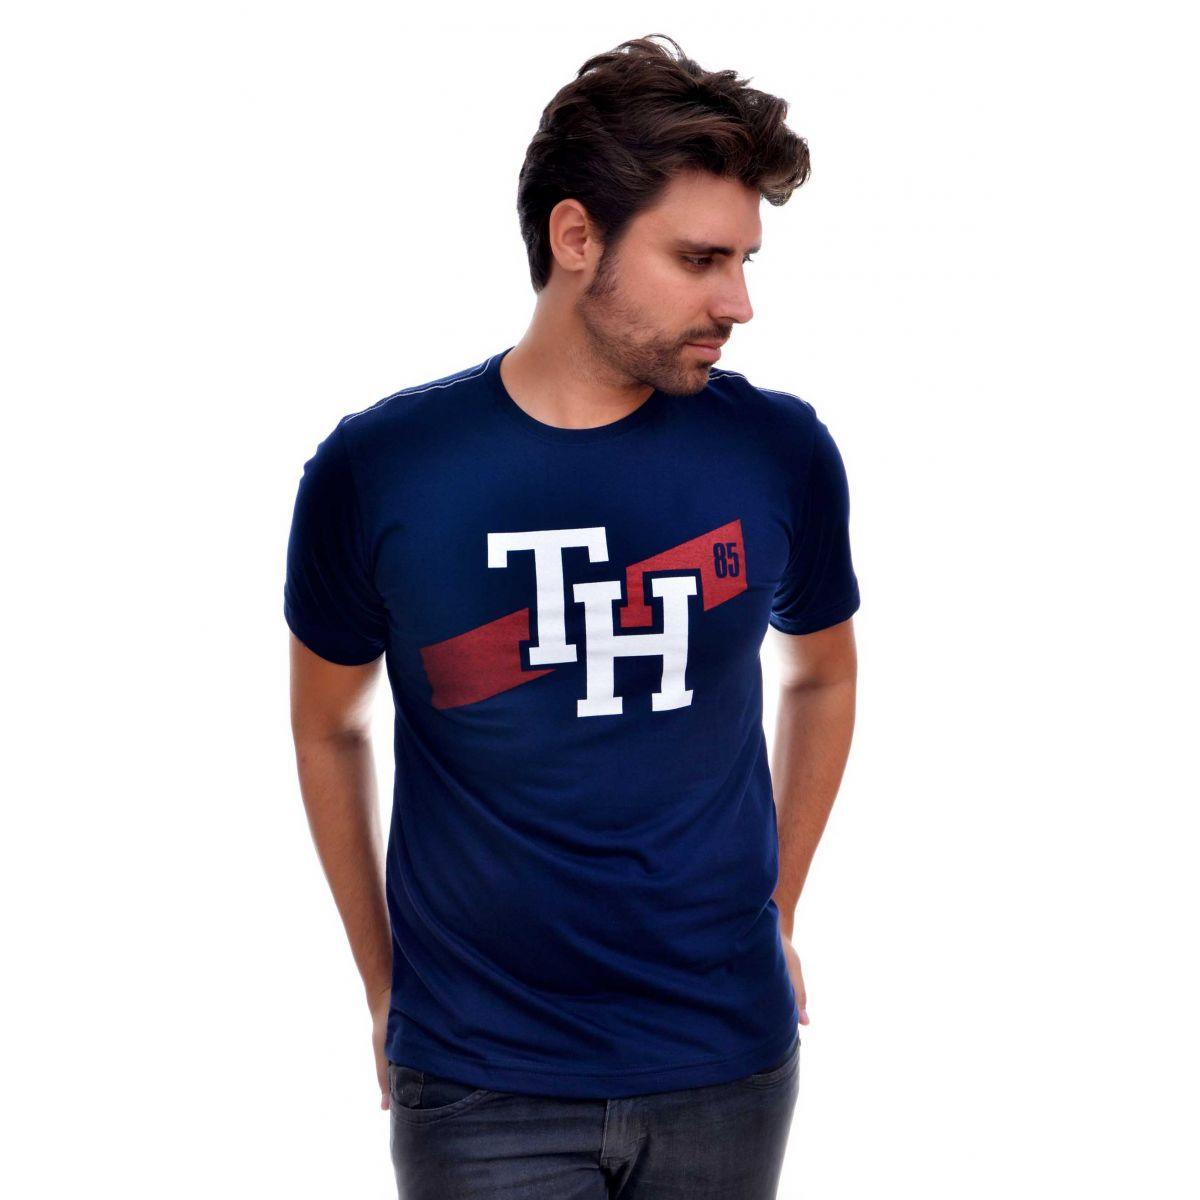 Camiseta TH '85 Azul Marinho